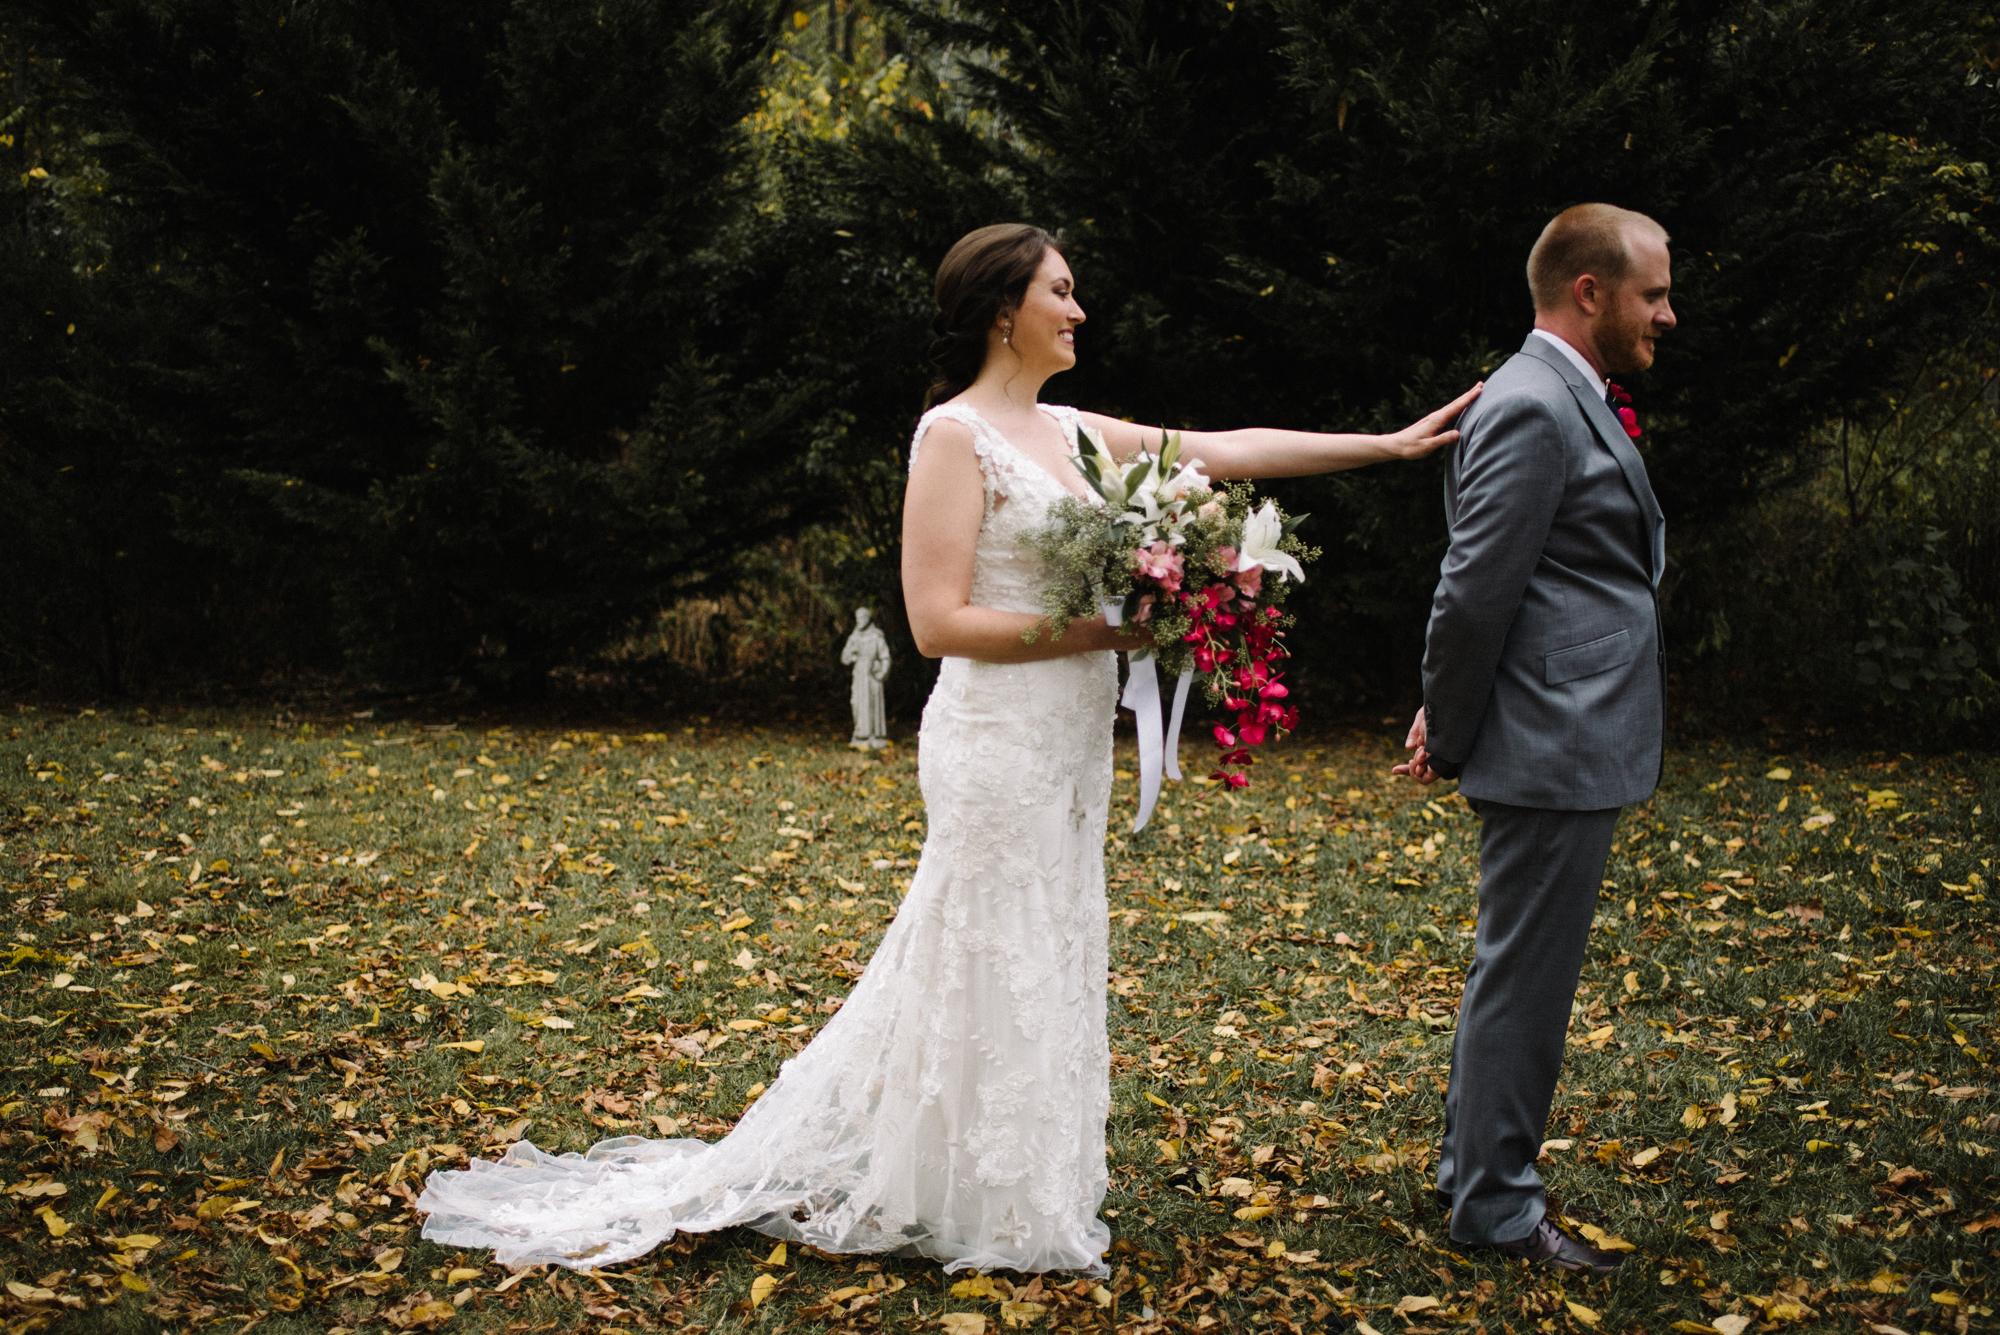 Mandi-and-Jordan-Intimate-Backyard-River-Wedding-Shenandoah-Valley_15.JPG